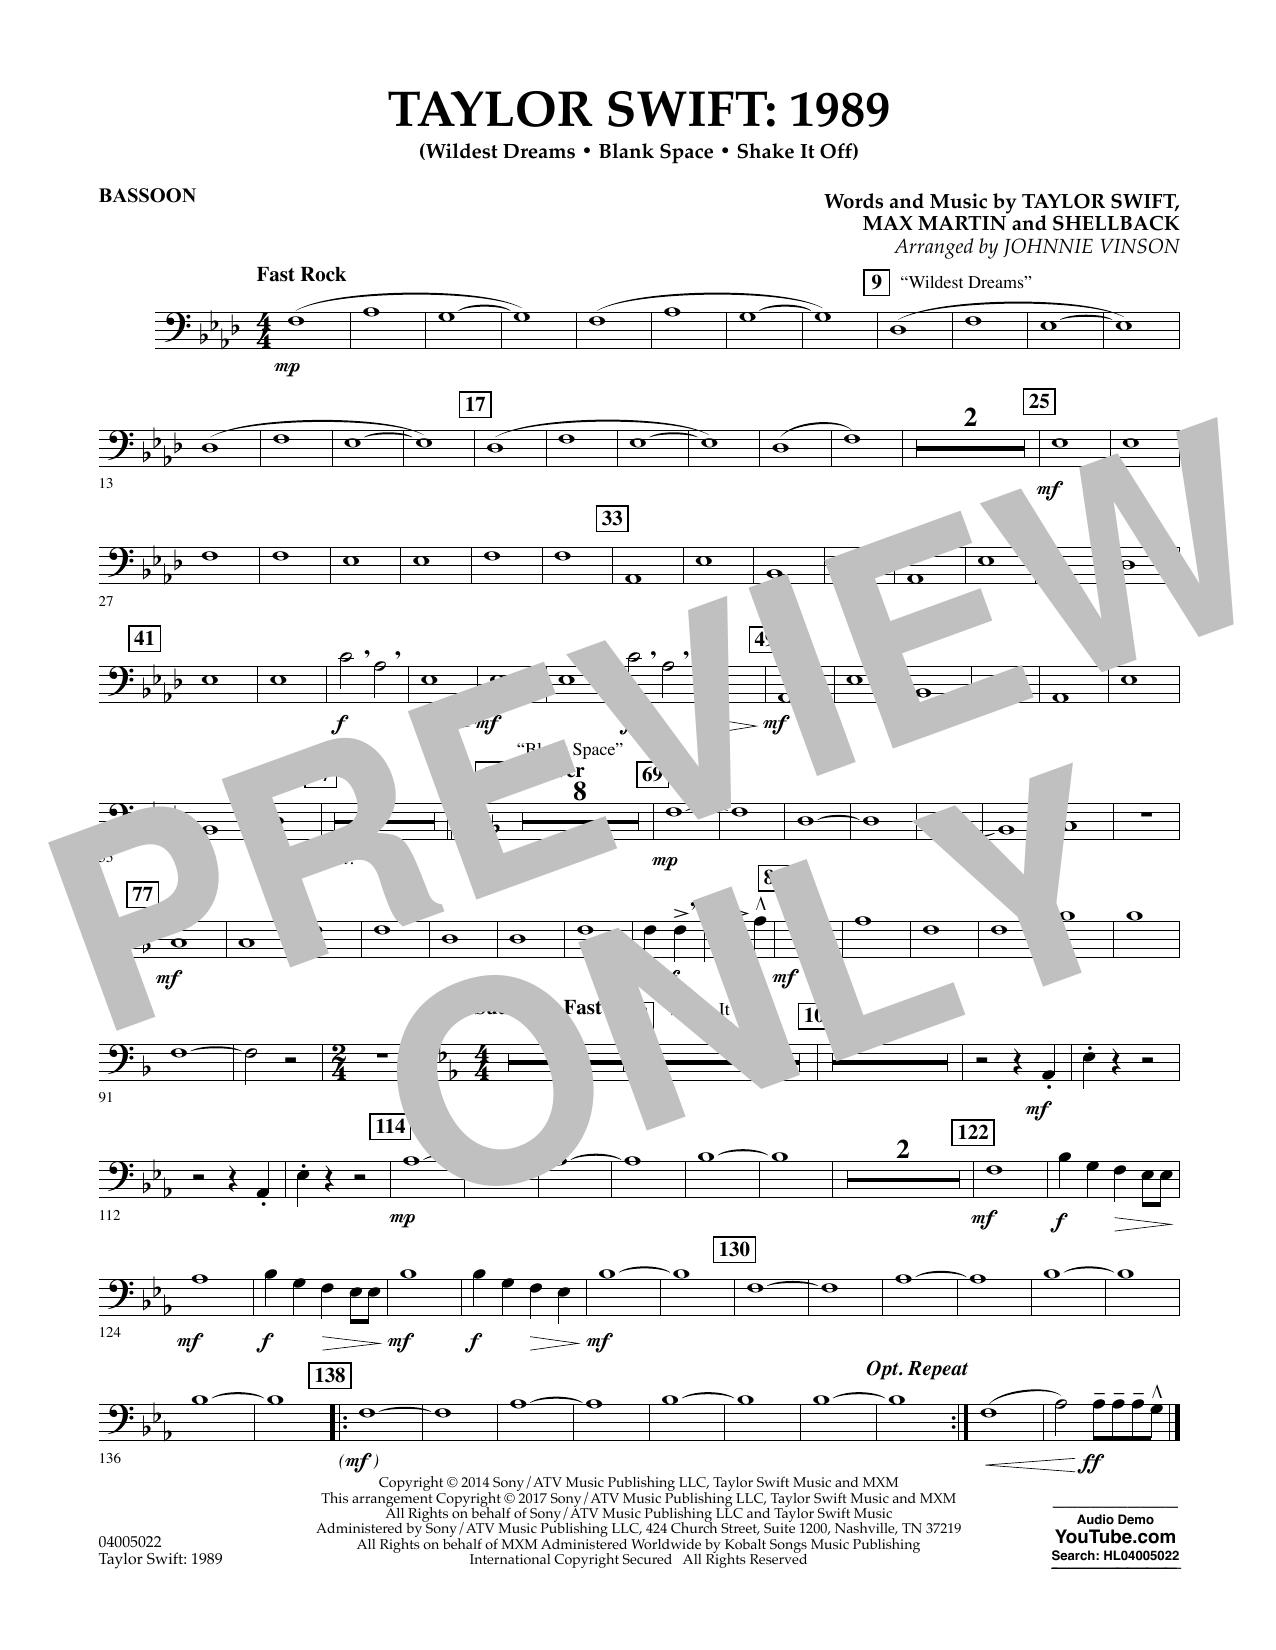 Taylor Swift: 1989 - Bassoon Sheet Music